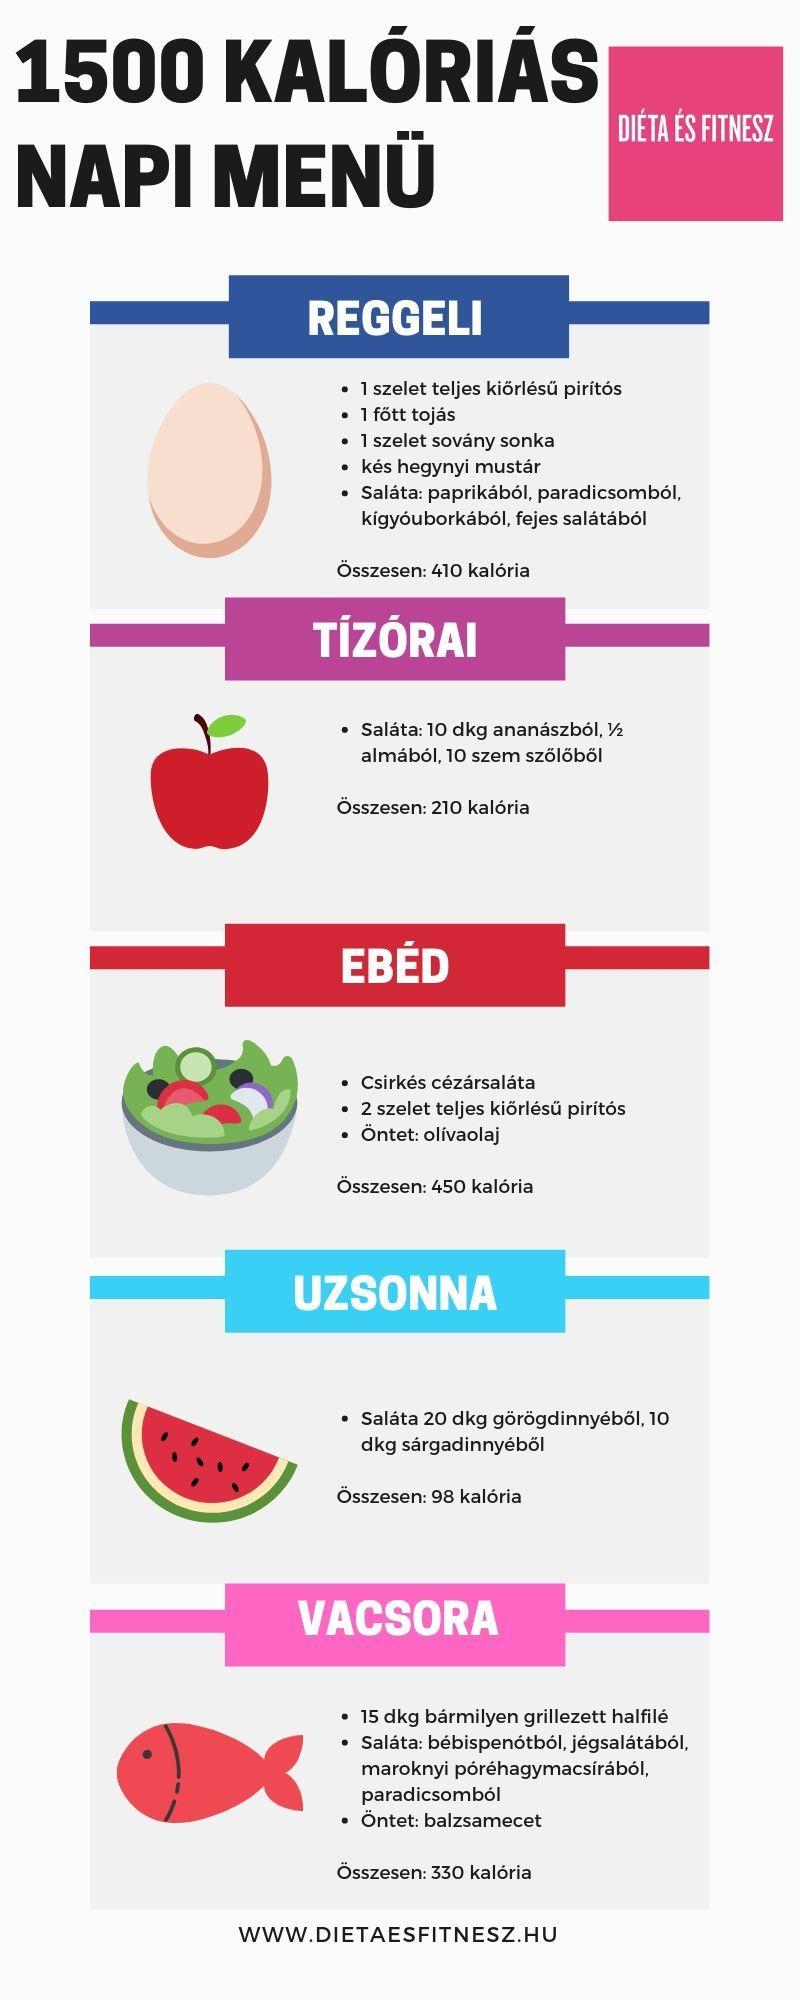 kalória diéta gyakori kérdések